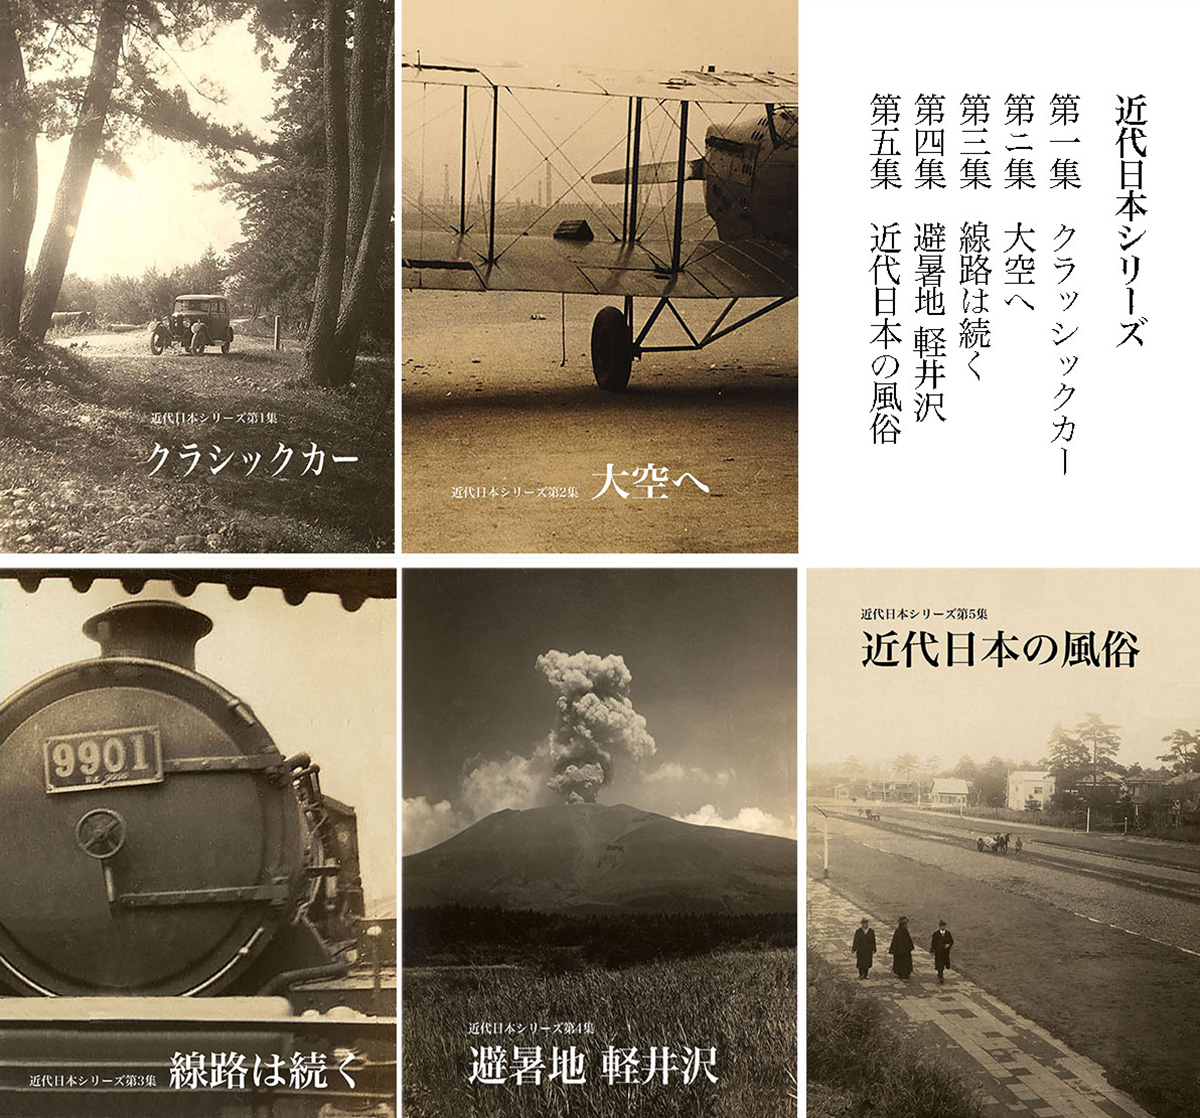 e01-header-03